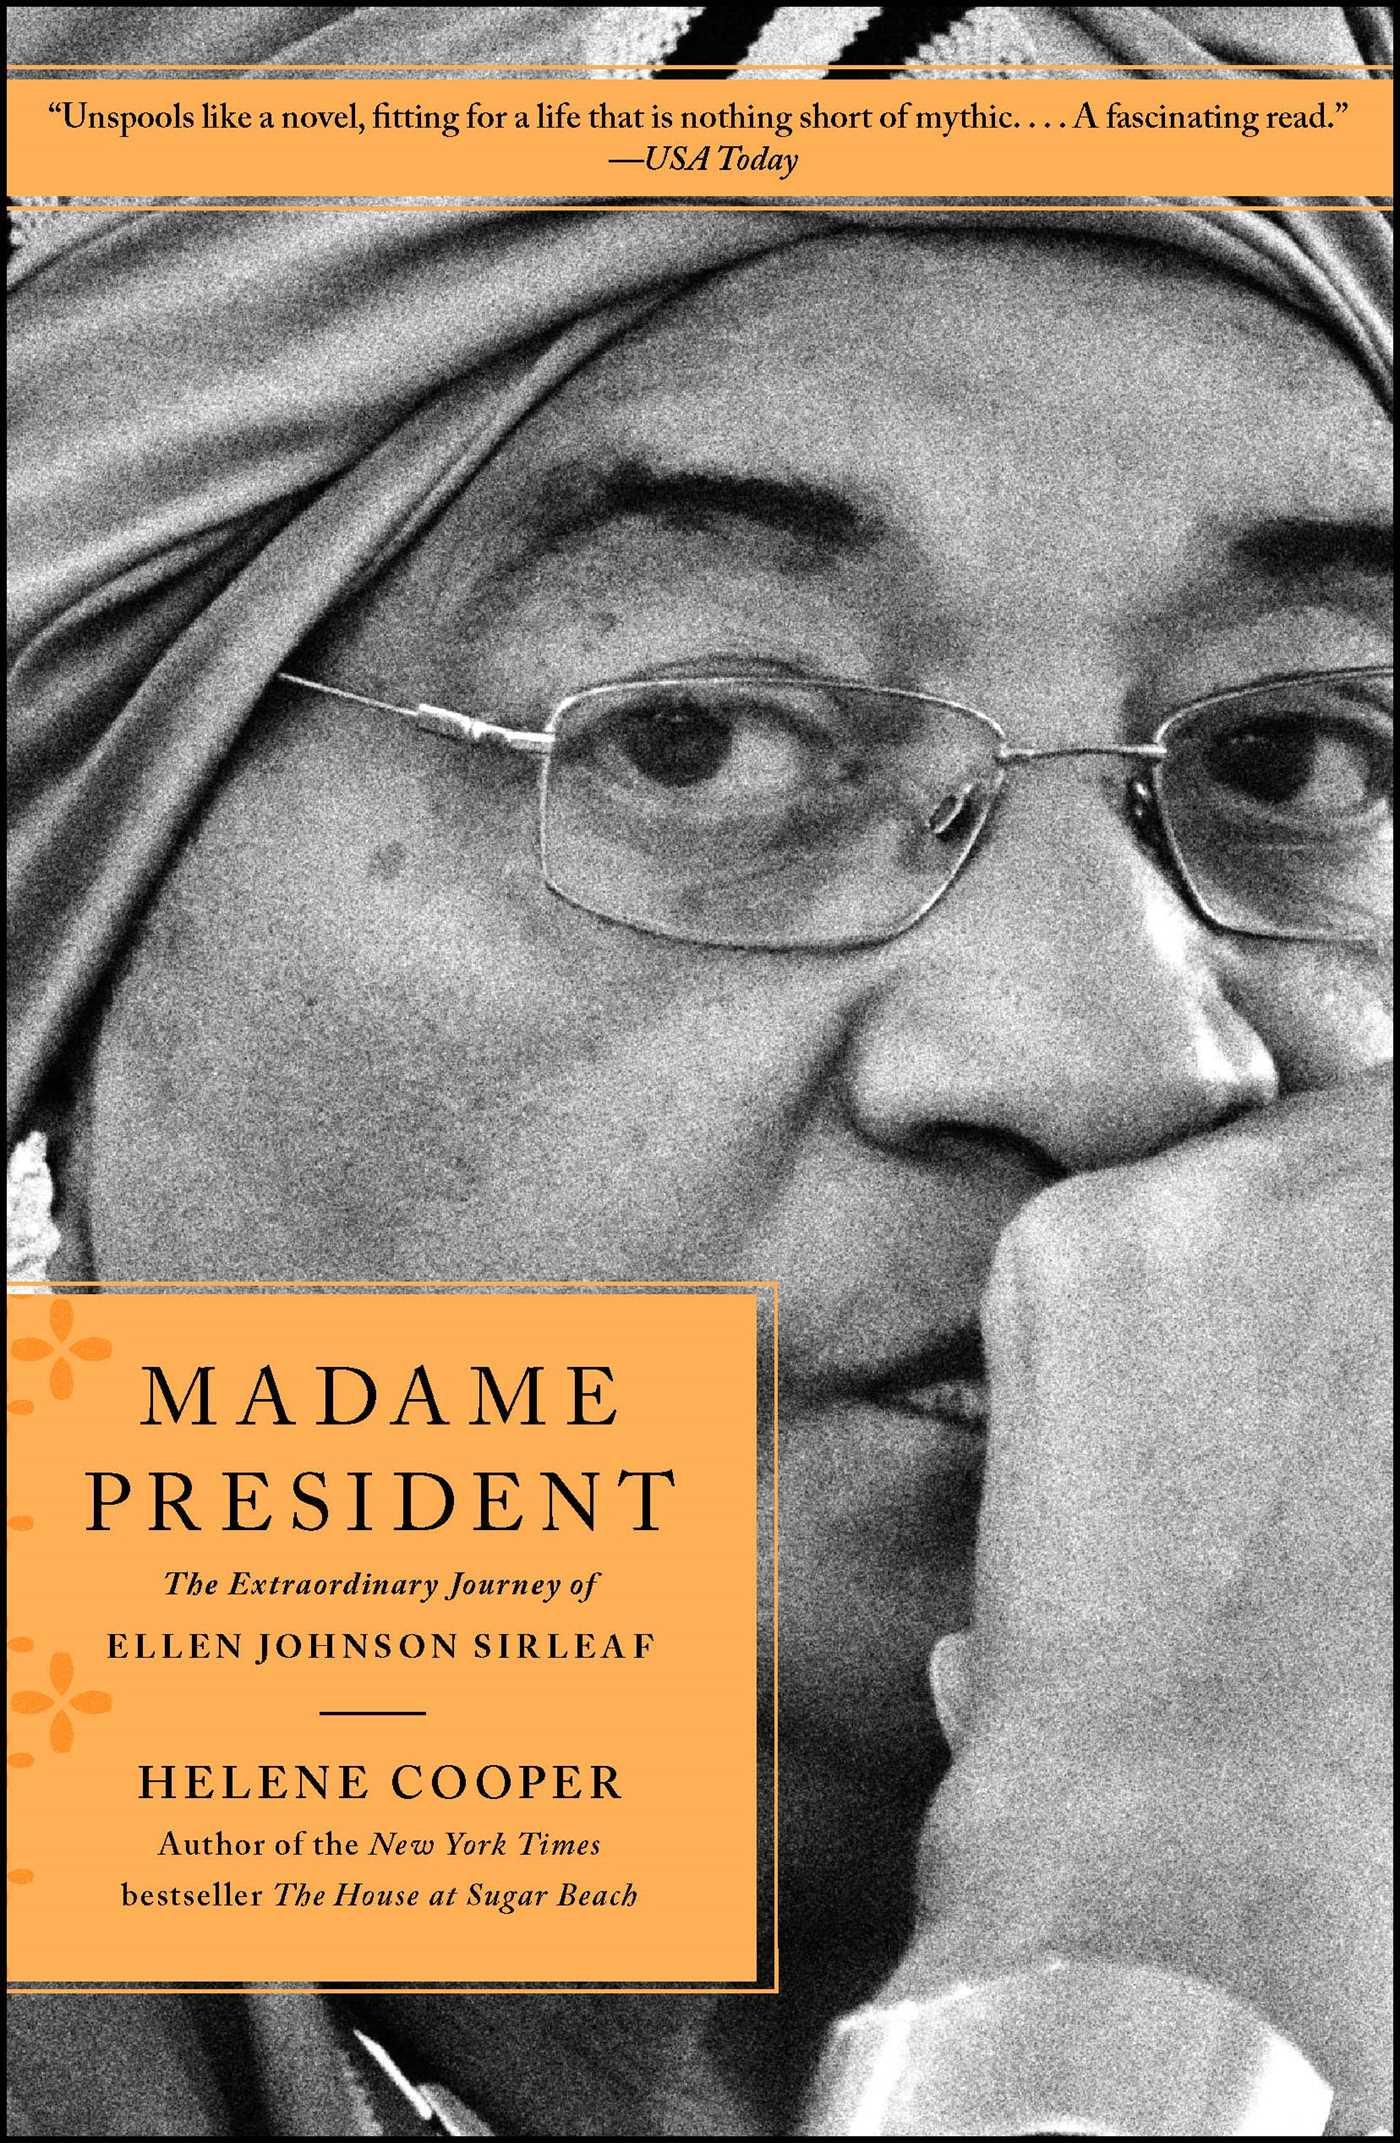 Madame president 9781451697360 hr